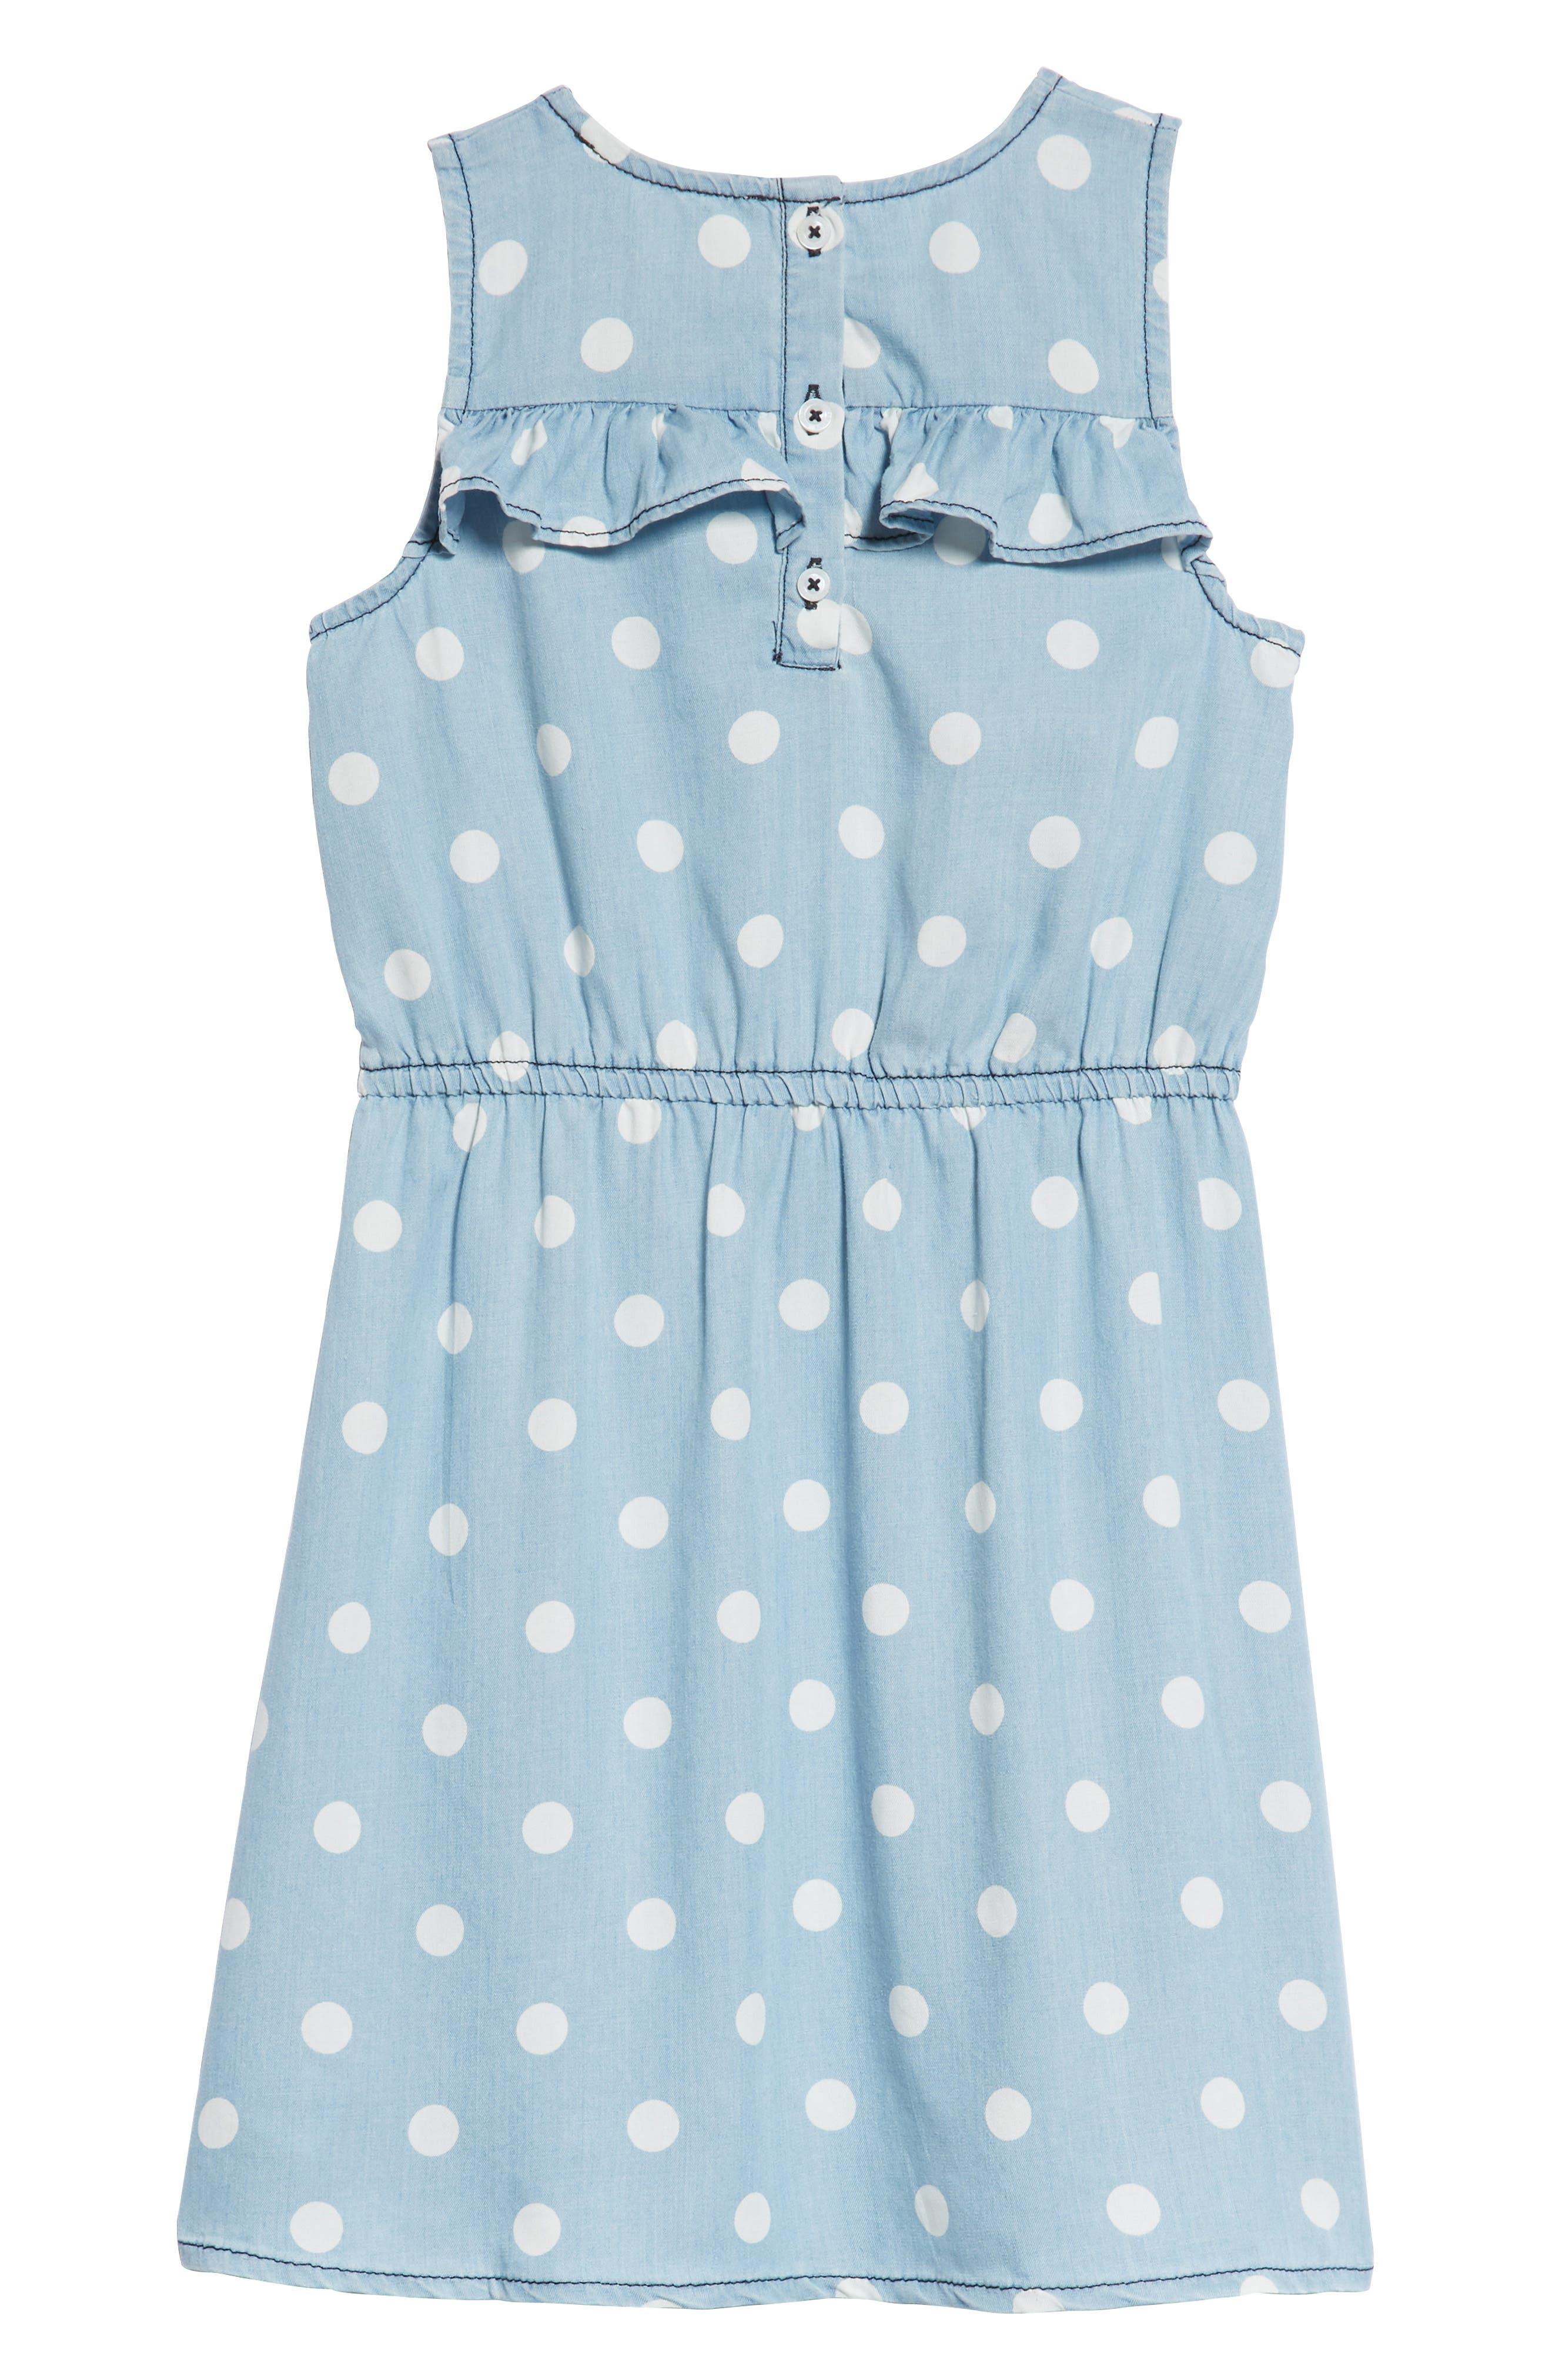 Polka Dot Ruffle Dress,                             Alternate thumbnail 2, color,                             Blue Wash Dot Print